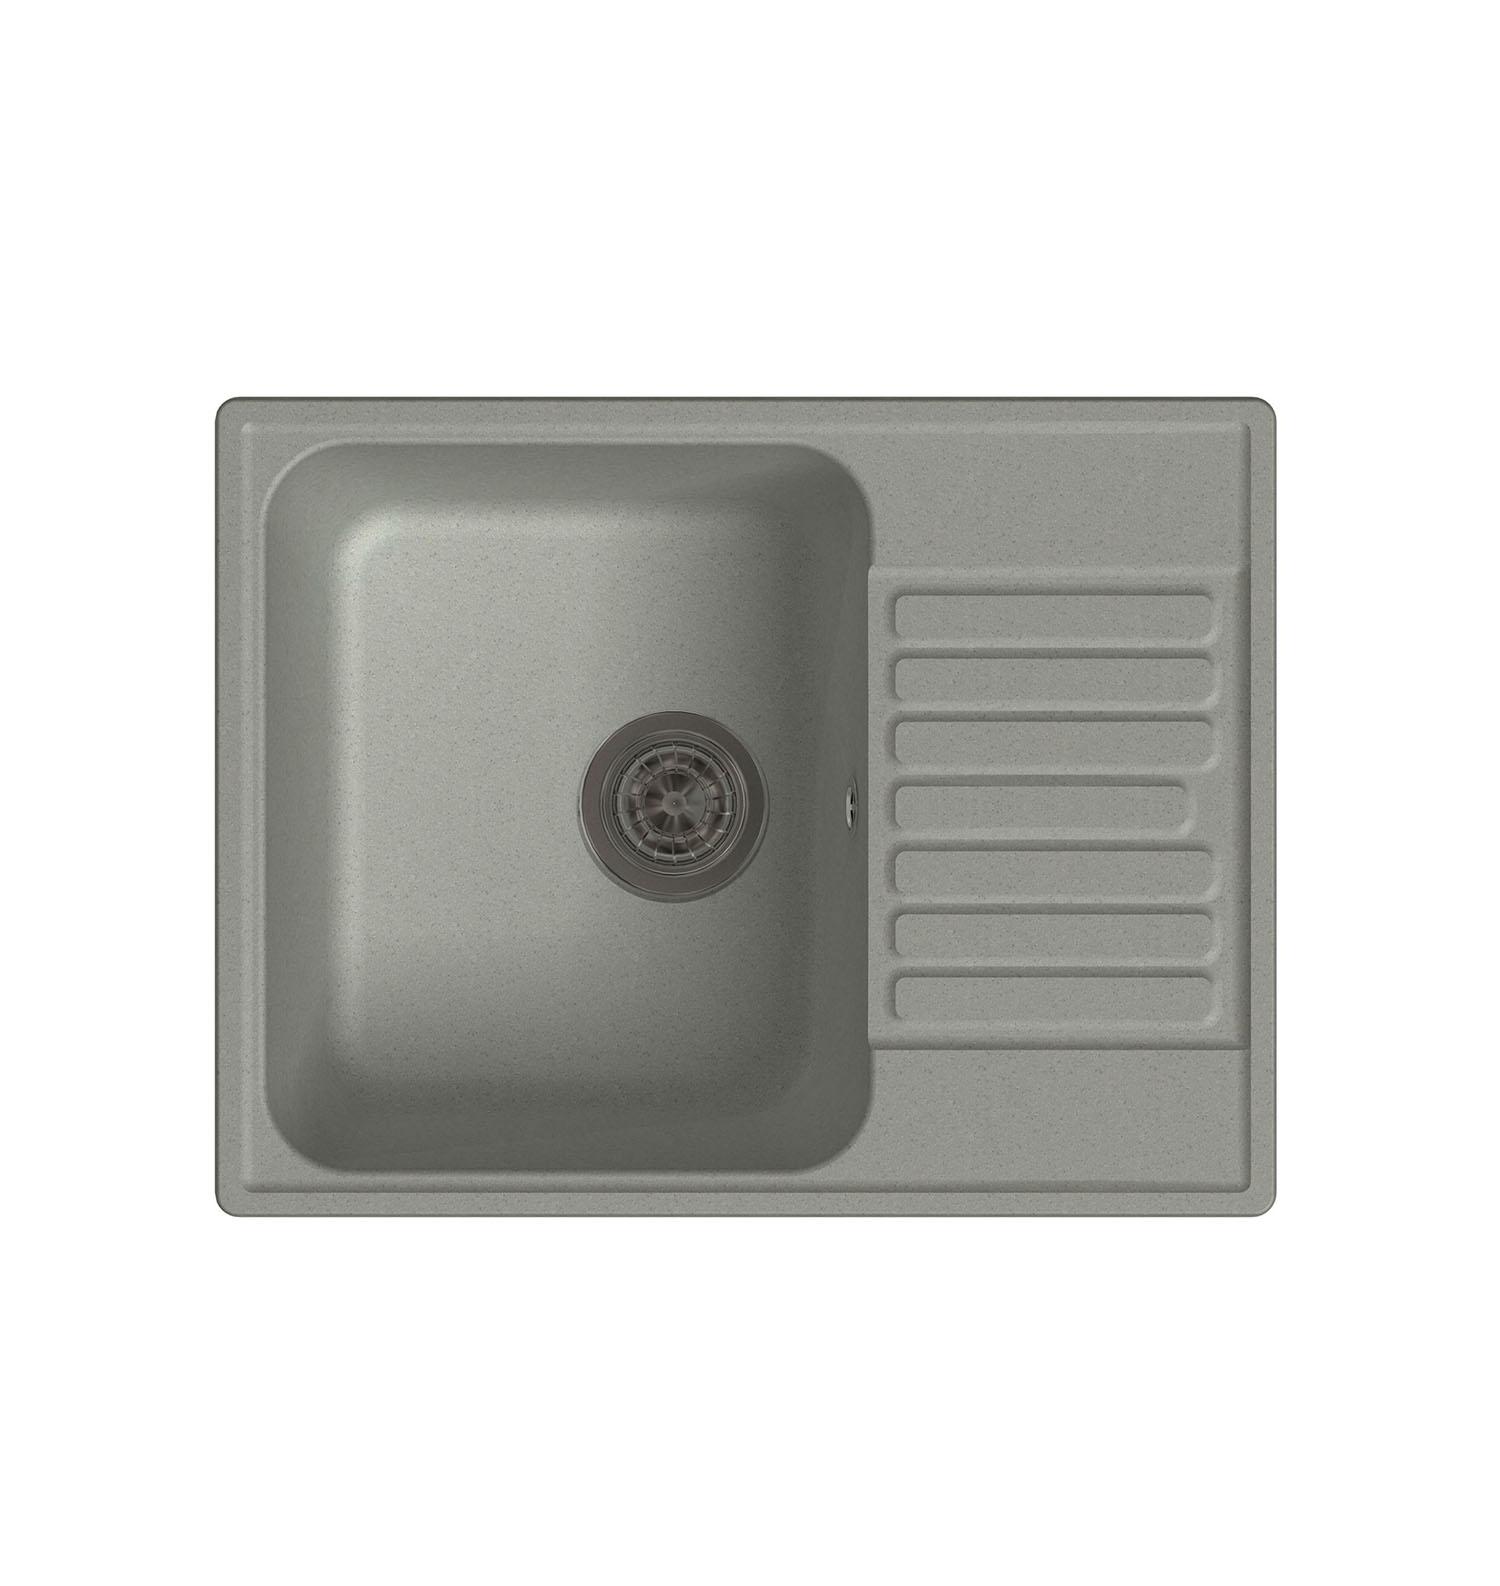 LEX Garda 620 Space Gray кухонная мойка lex garda 620 black черный